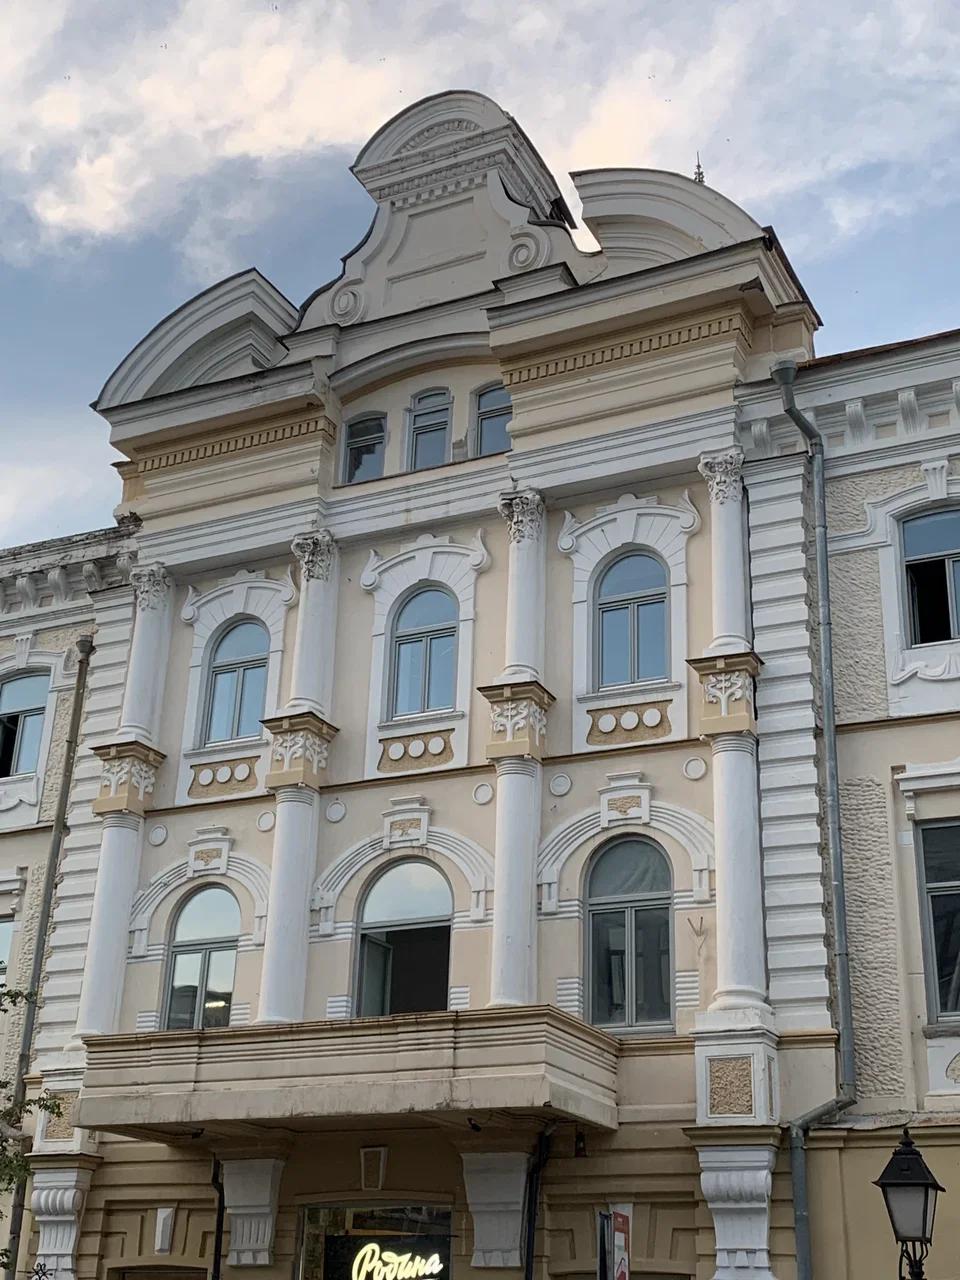 Казань, июль 2021. Фото Галины Макаровой